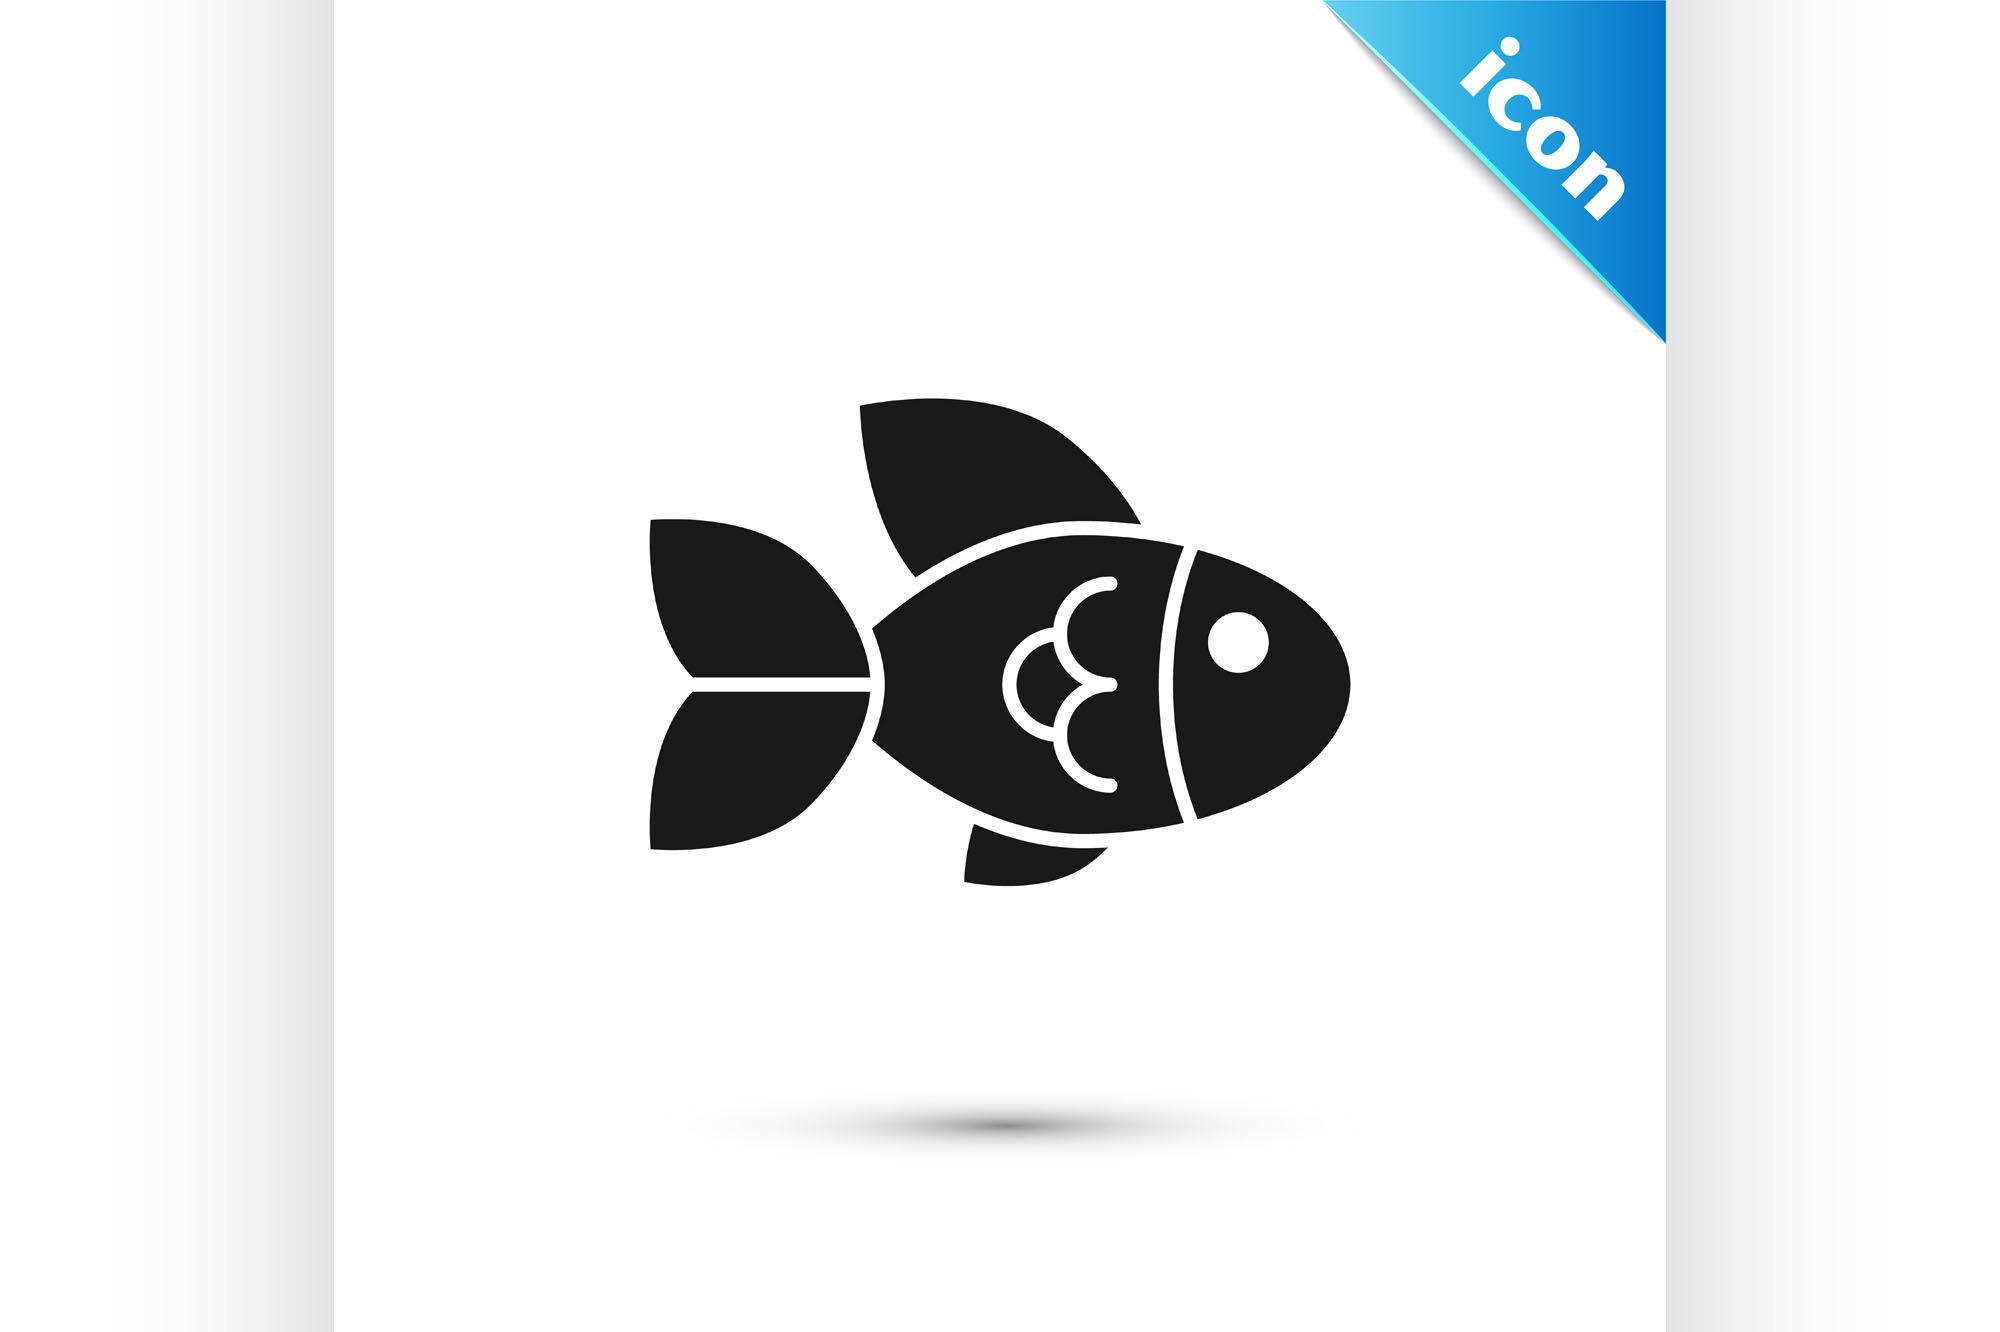 Black Fish Icon Isolated On White Background Vector Illustration